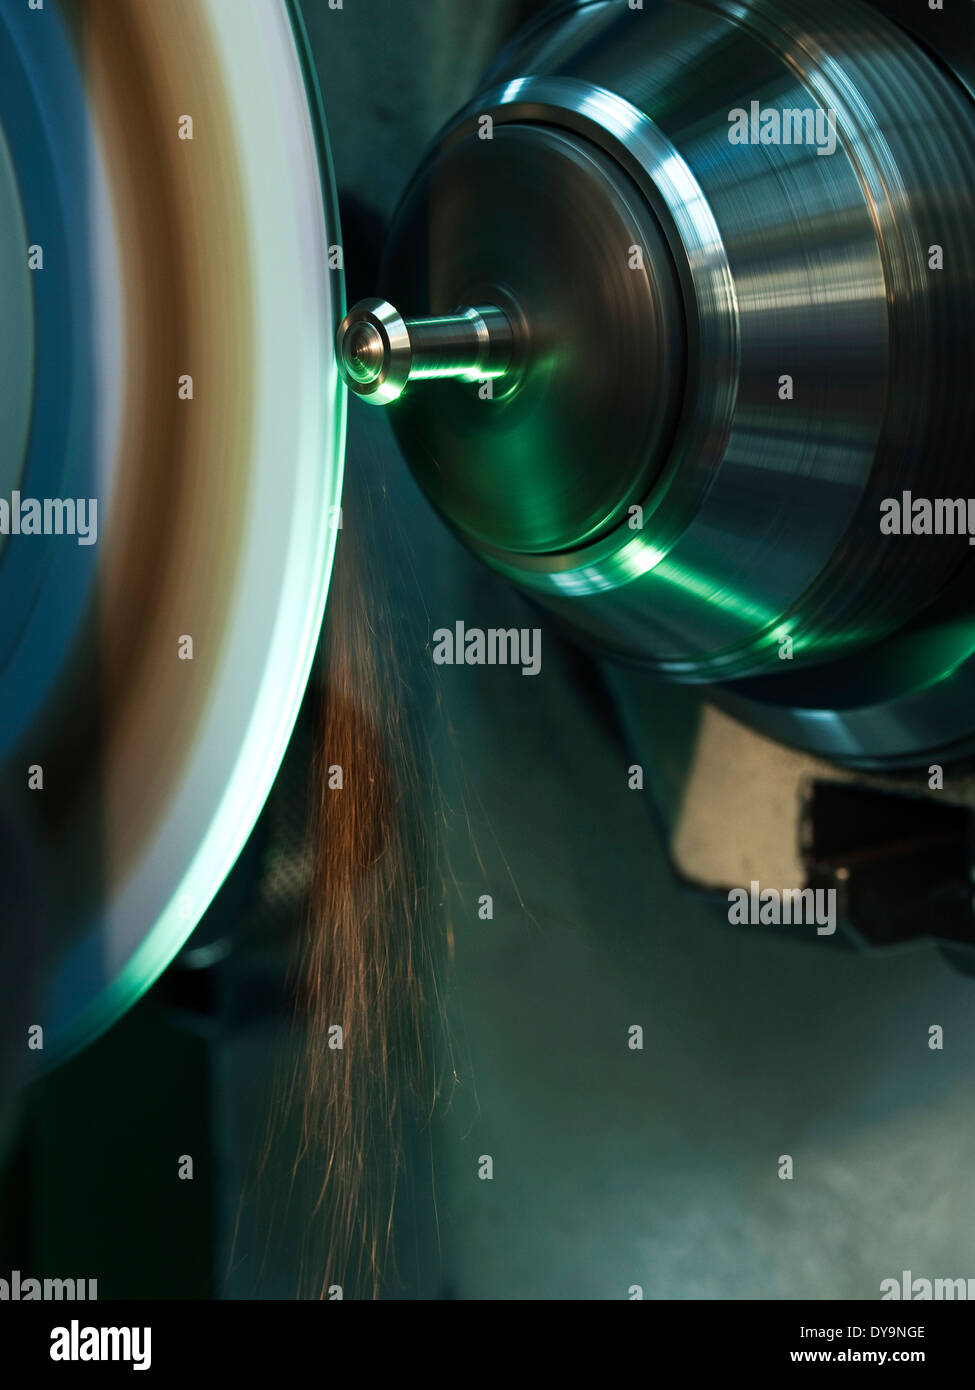 Engineering, grinding - Stock Image